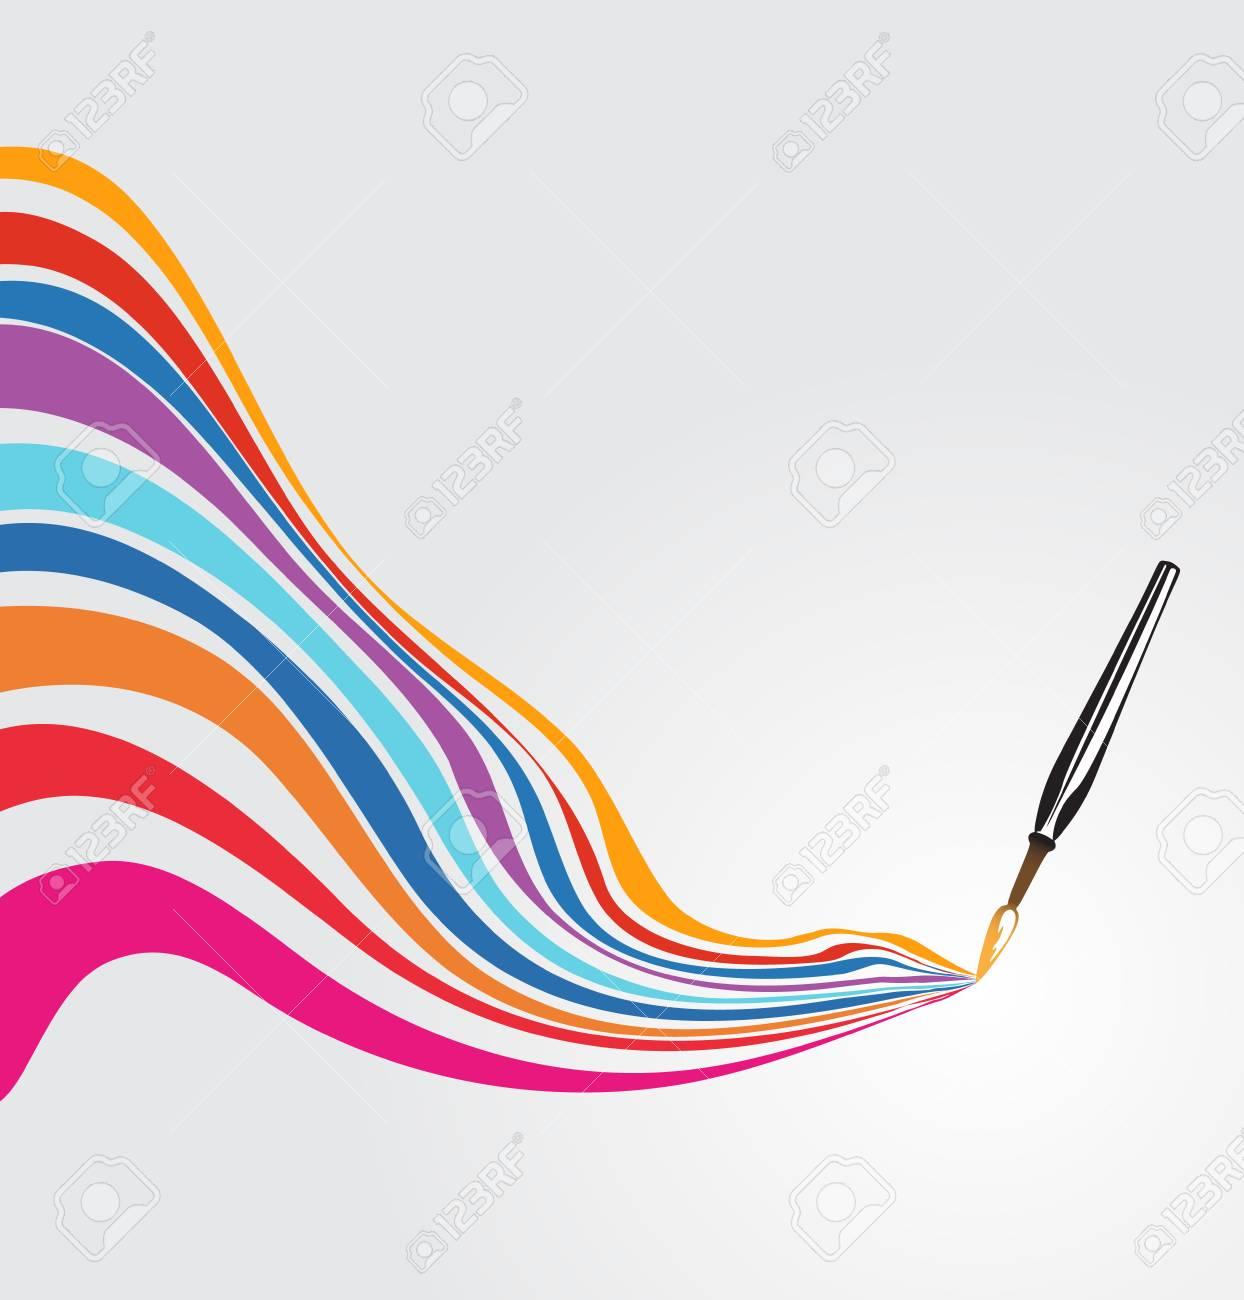 Paintbrush drawing a rainbow - 51811886